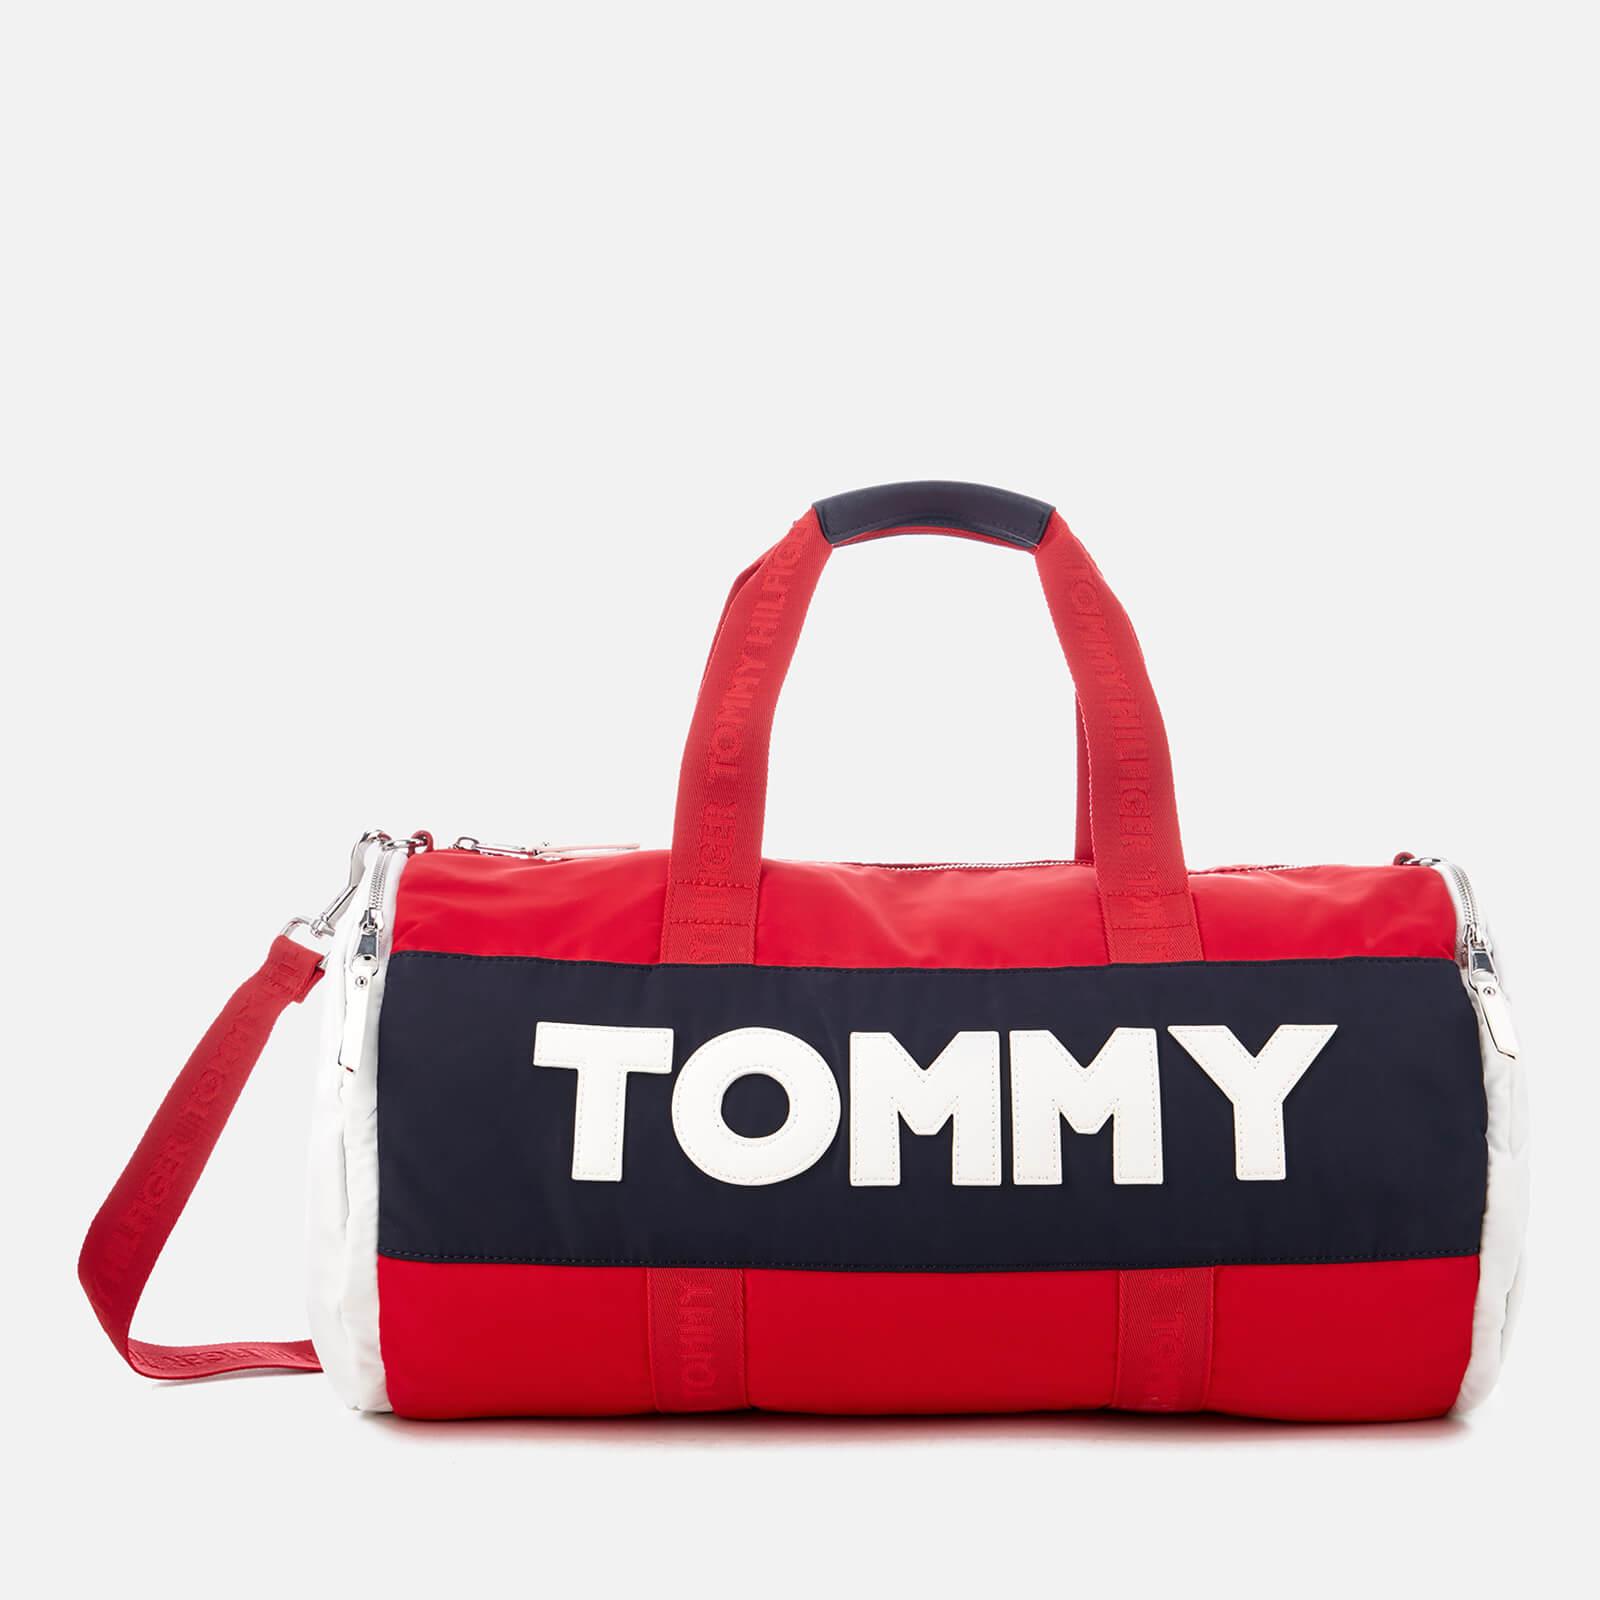 7191b044 Tommy Hilfiger Women's Tommy Nylon Duffle Bag - Corporate Womens  Accessories | TheHut.com